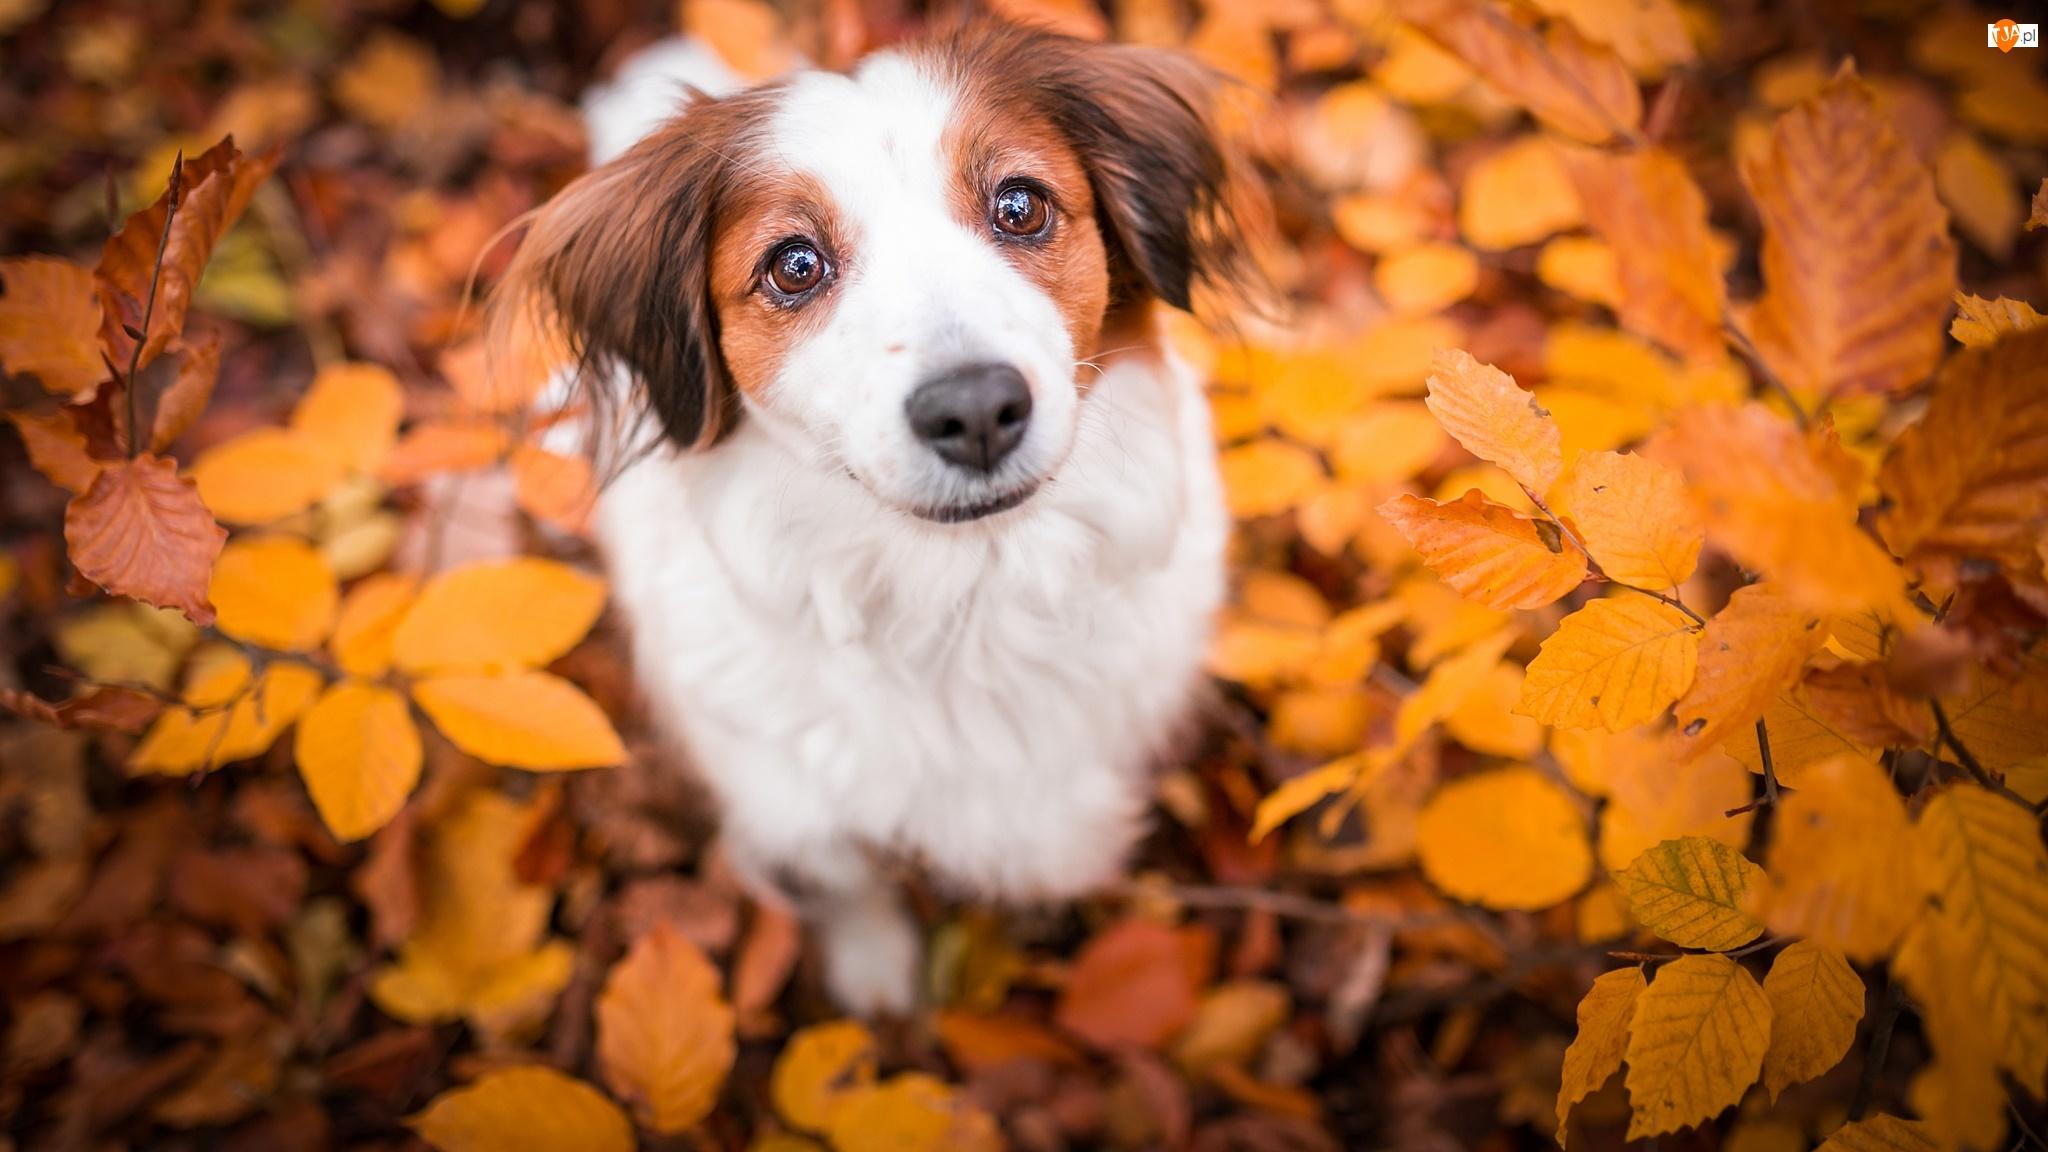 Liście, Pies, Płochacz holenderski, Kooikerhondje